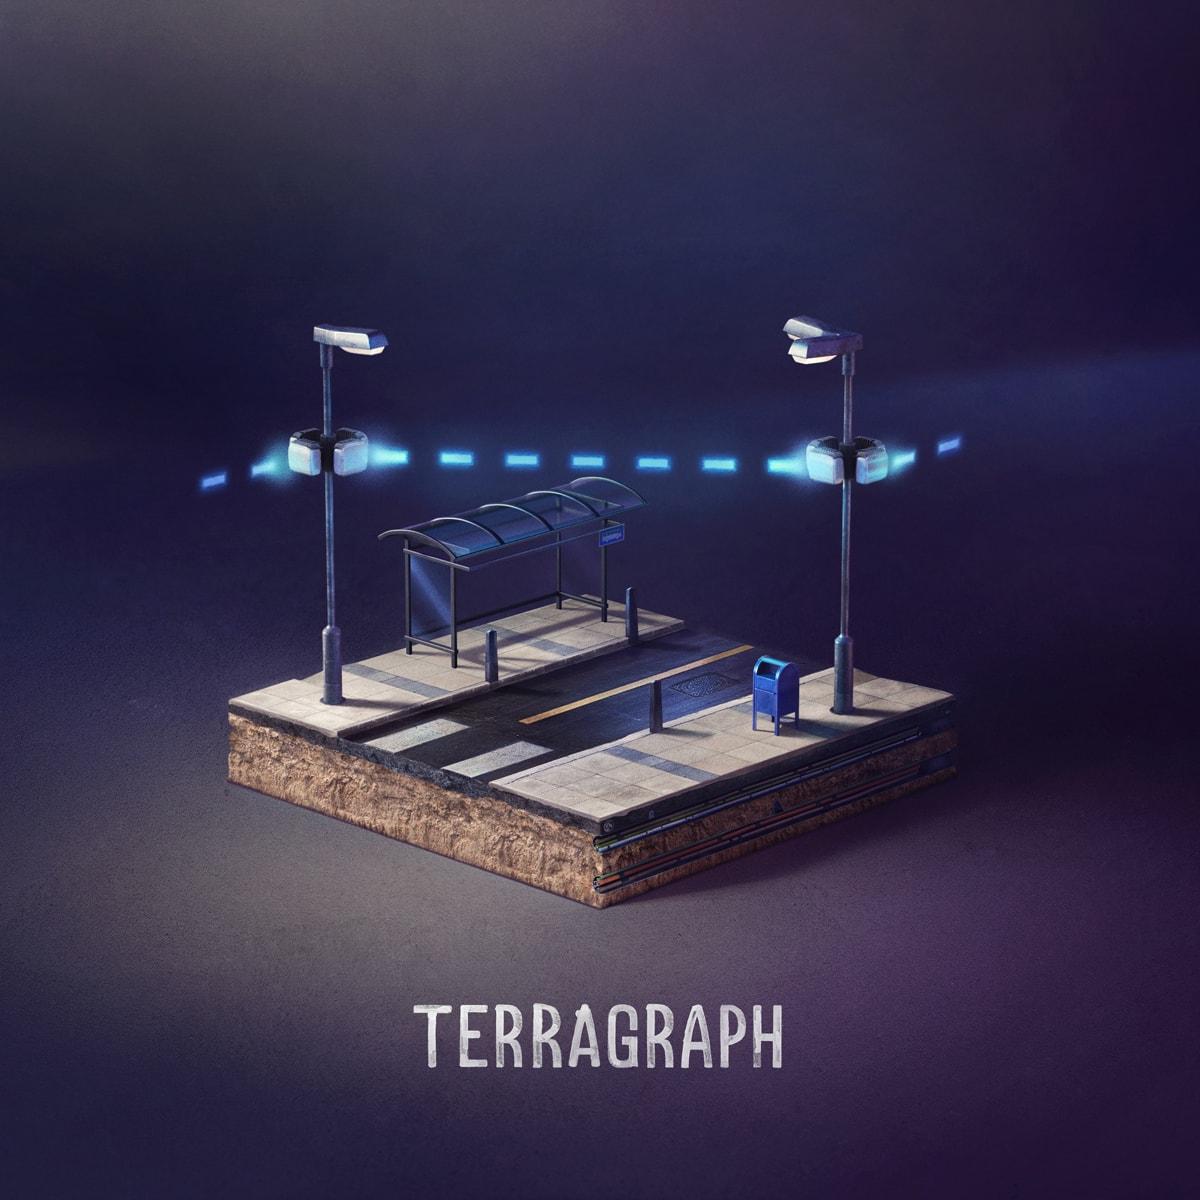 mosk_int_org_i_terragraph